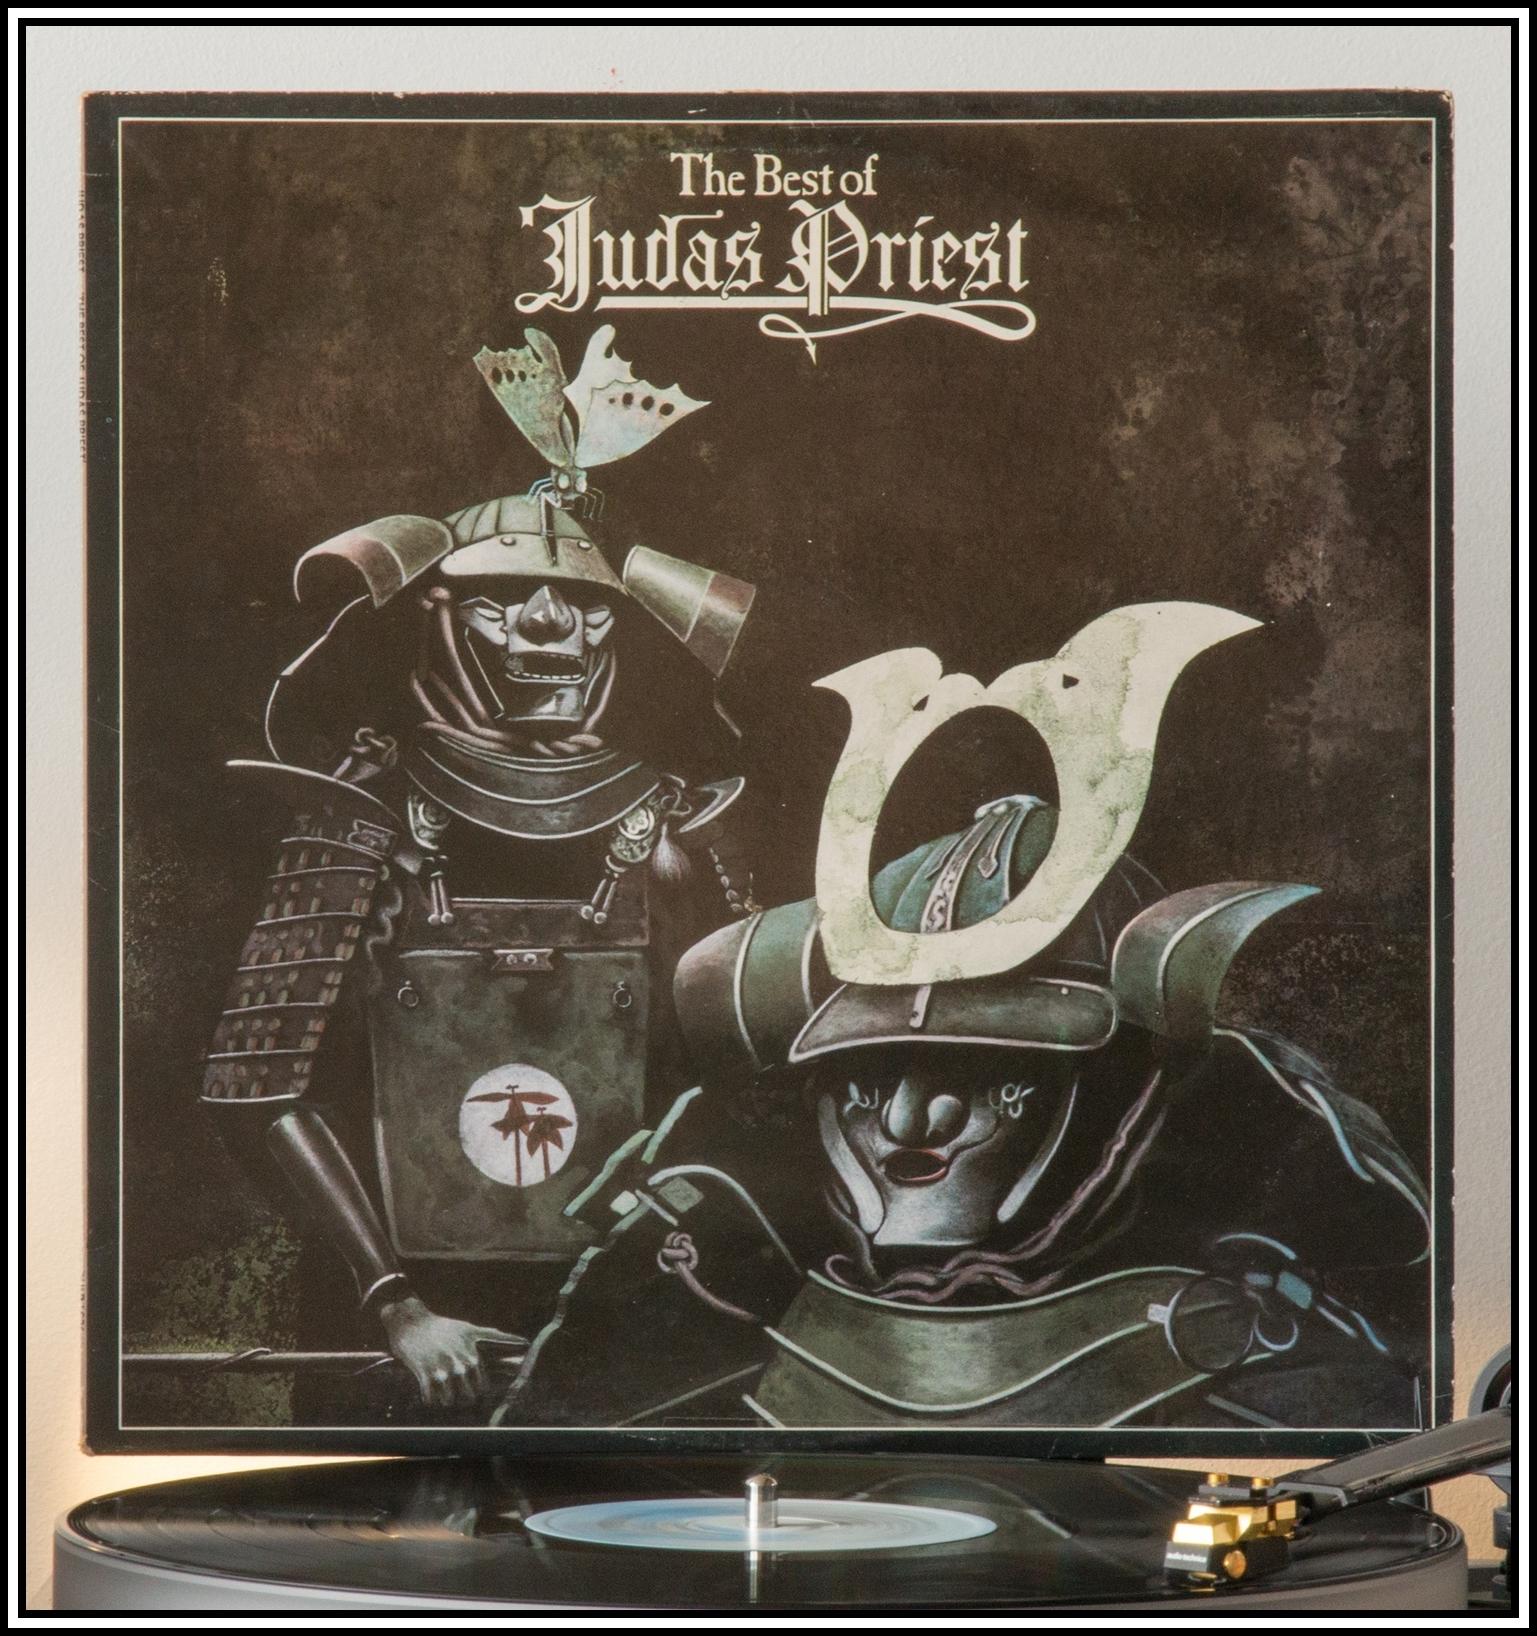 2420 - Judas Priest - The Best of (UK)(Front)